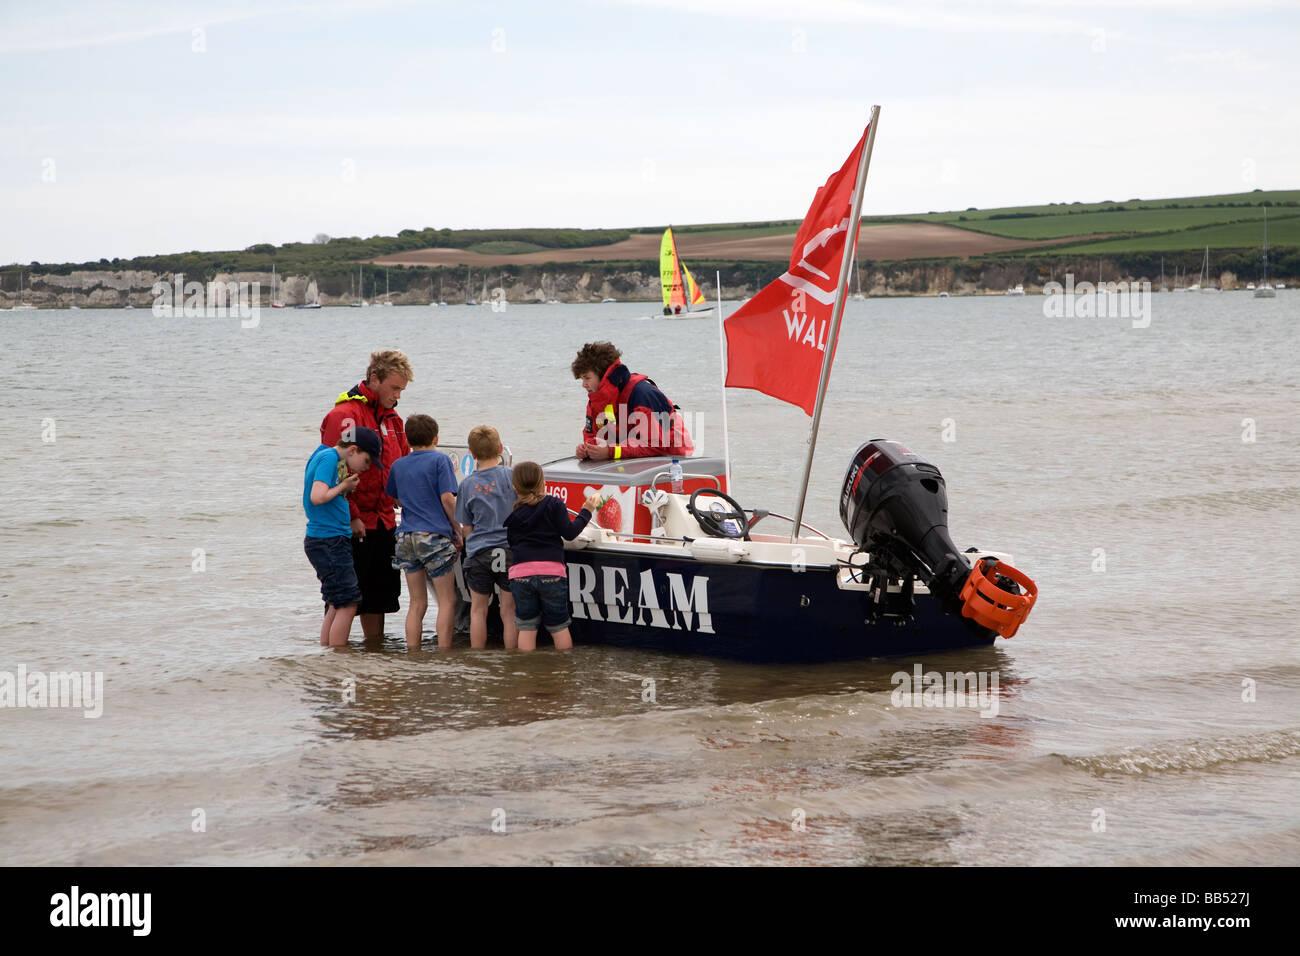 Ice cream boat children buying ice creams - Stock Image